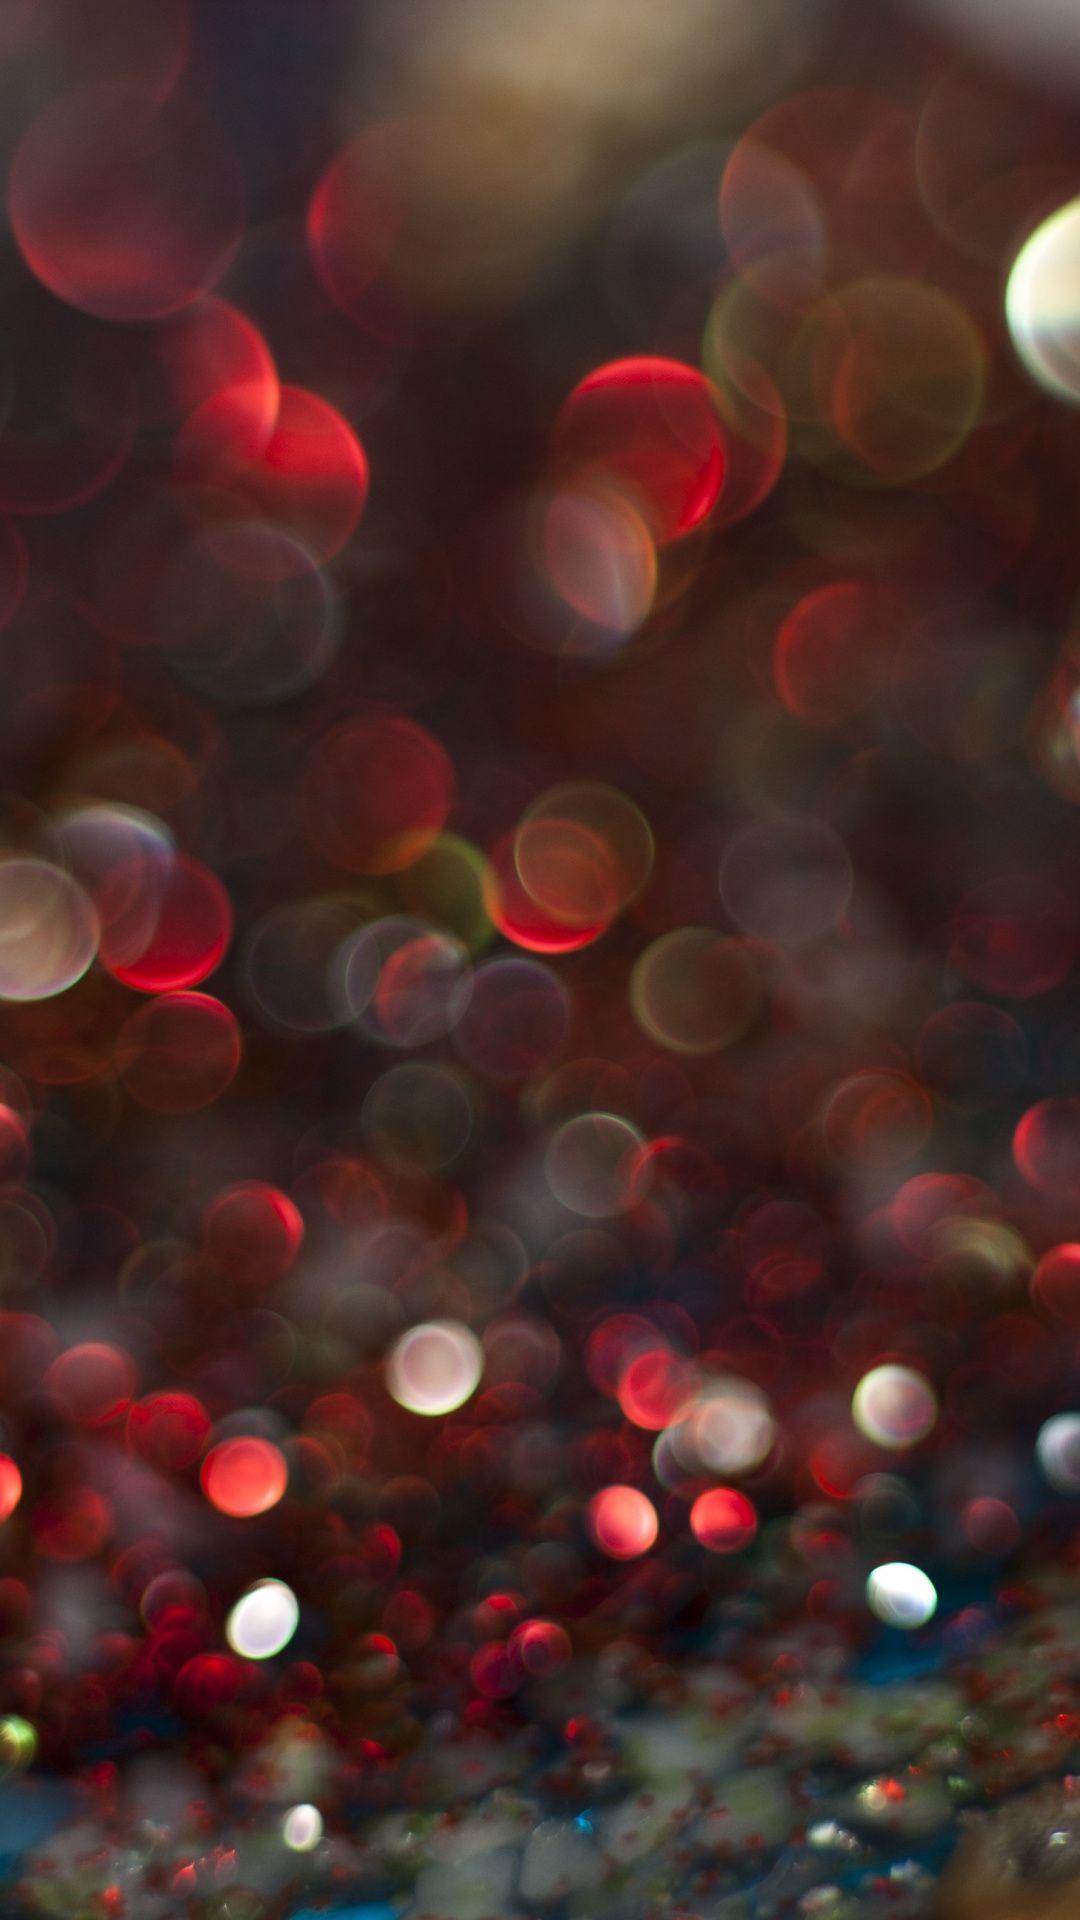 Red And Dark Abstract Bokeh Wallpaper Bokeh Wallpaper